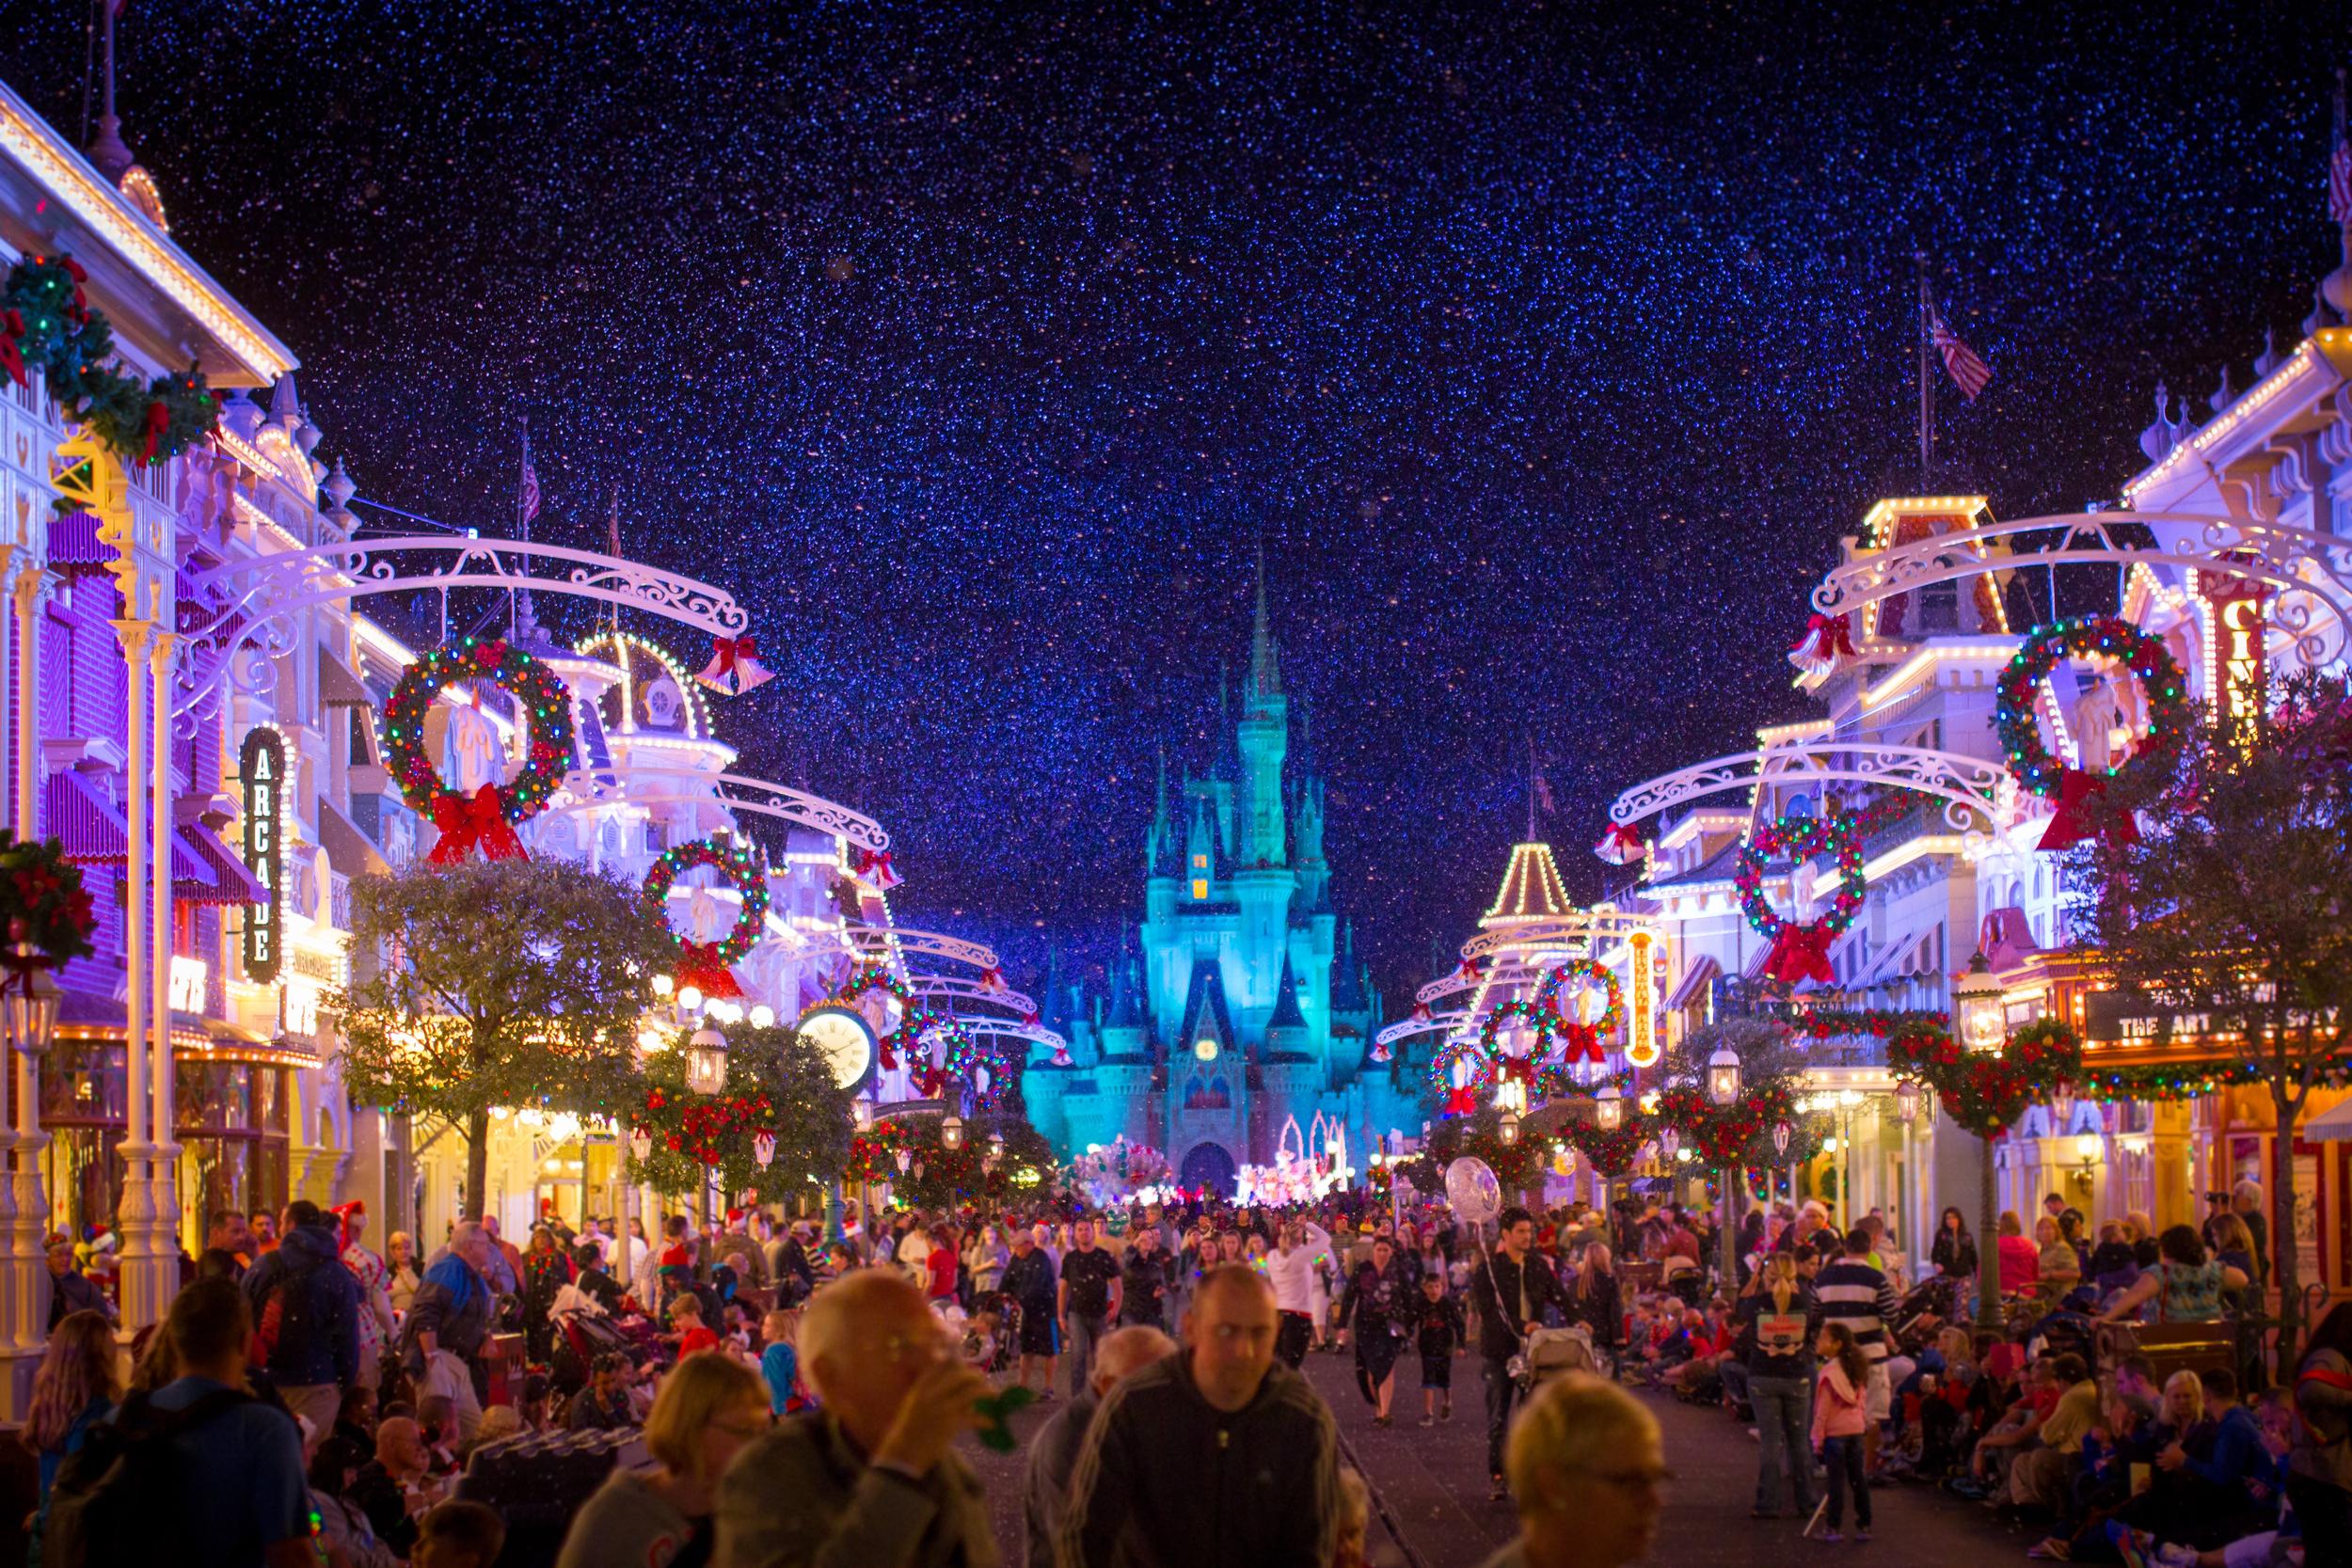 Cinderella's Castle in the background of a snowy Main Street, USA at the Magic Kingdom inside Walt Disney World.